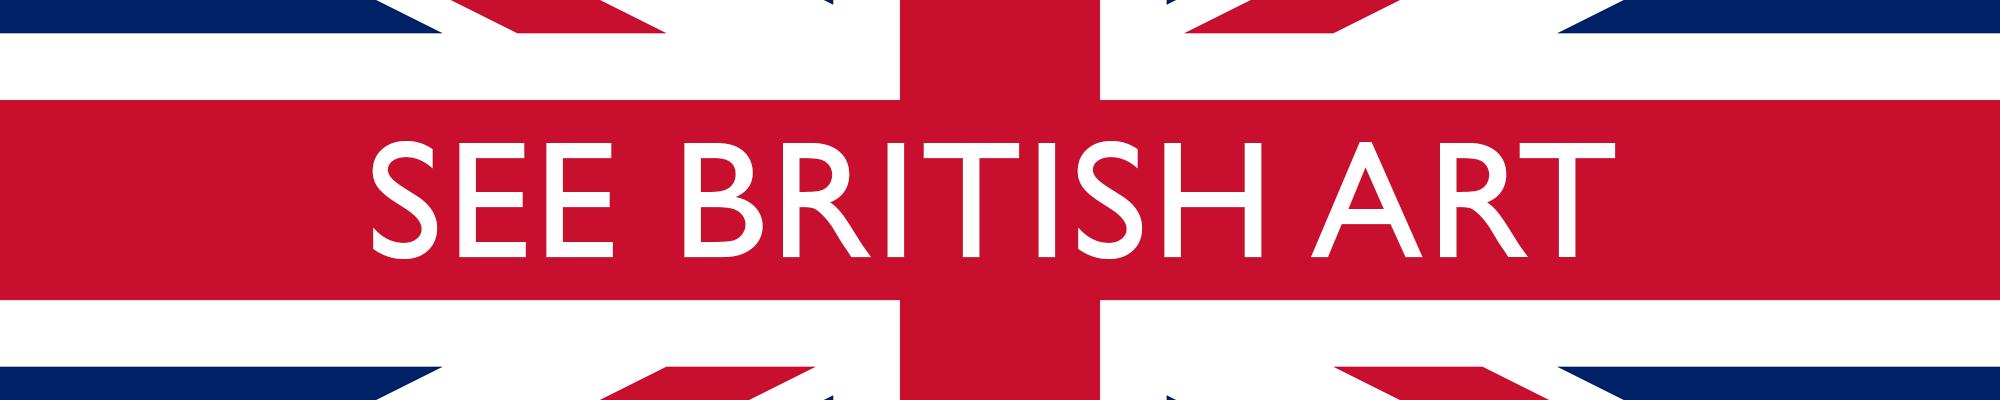 See British Art Blog